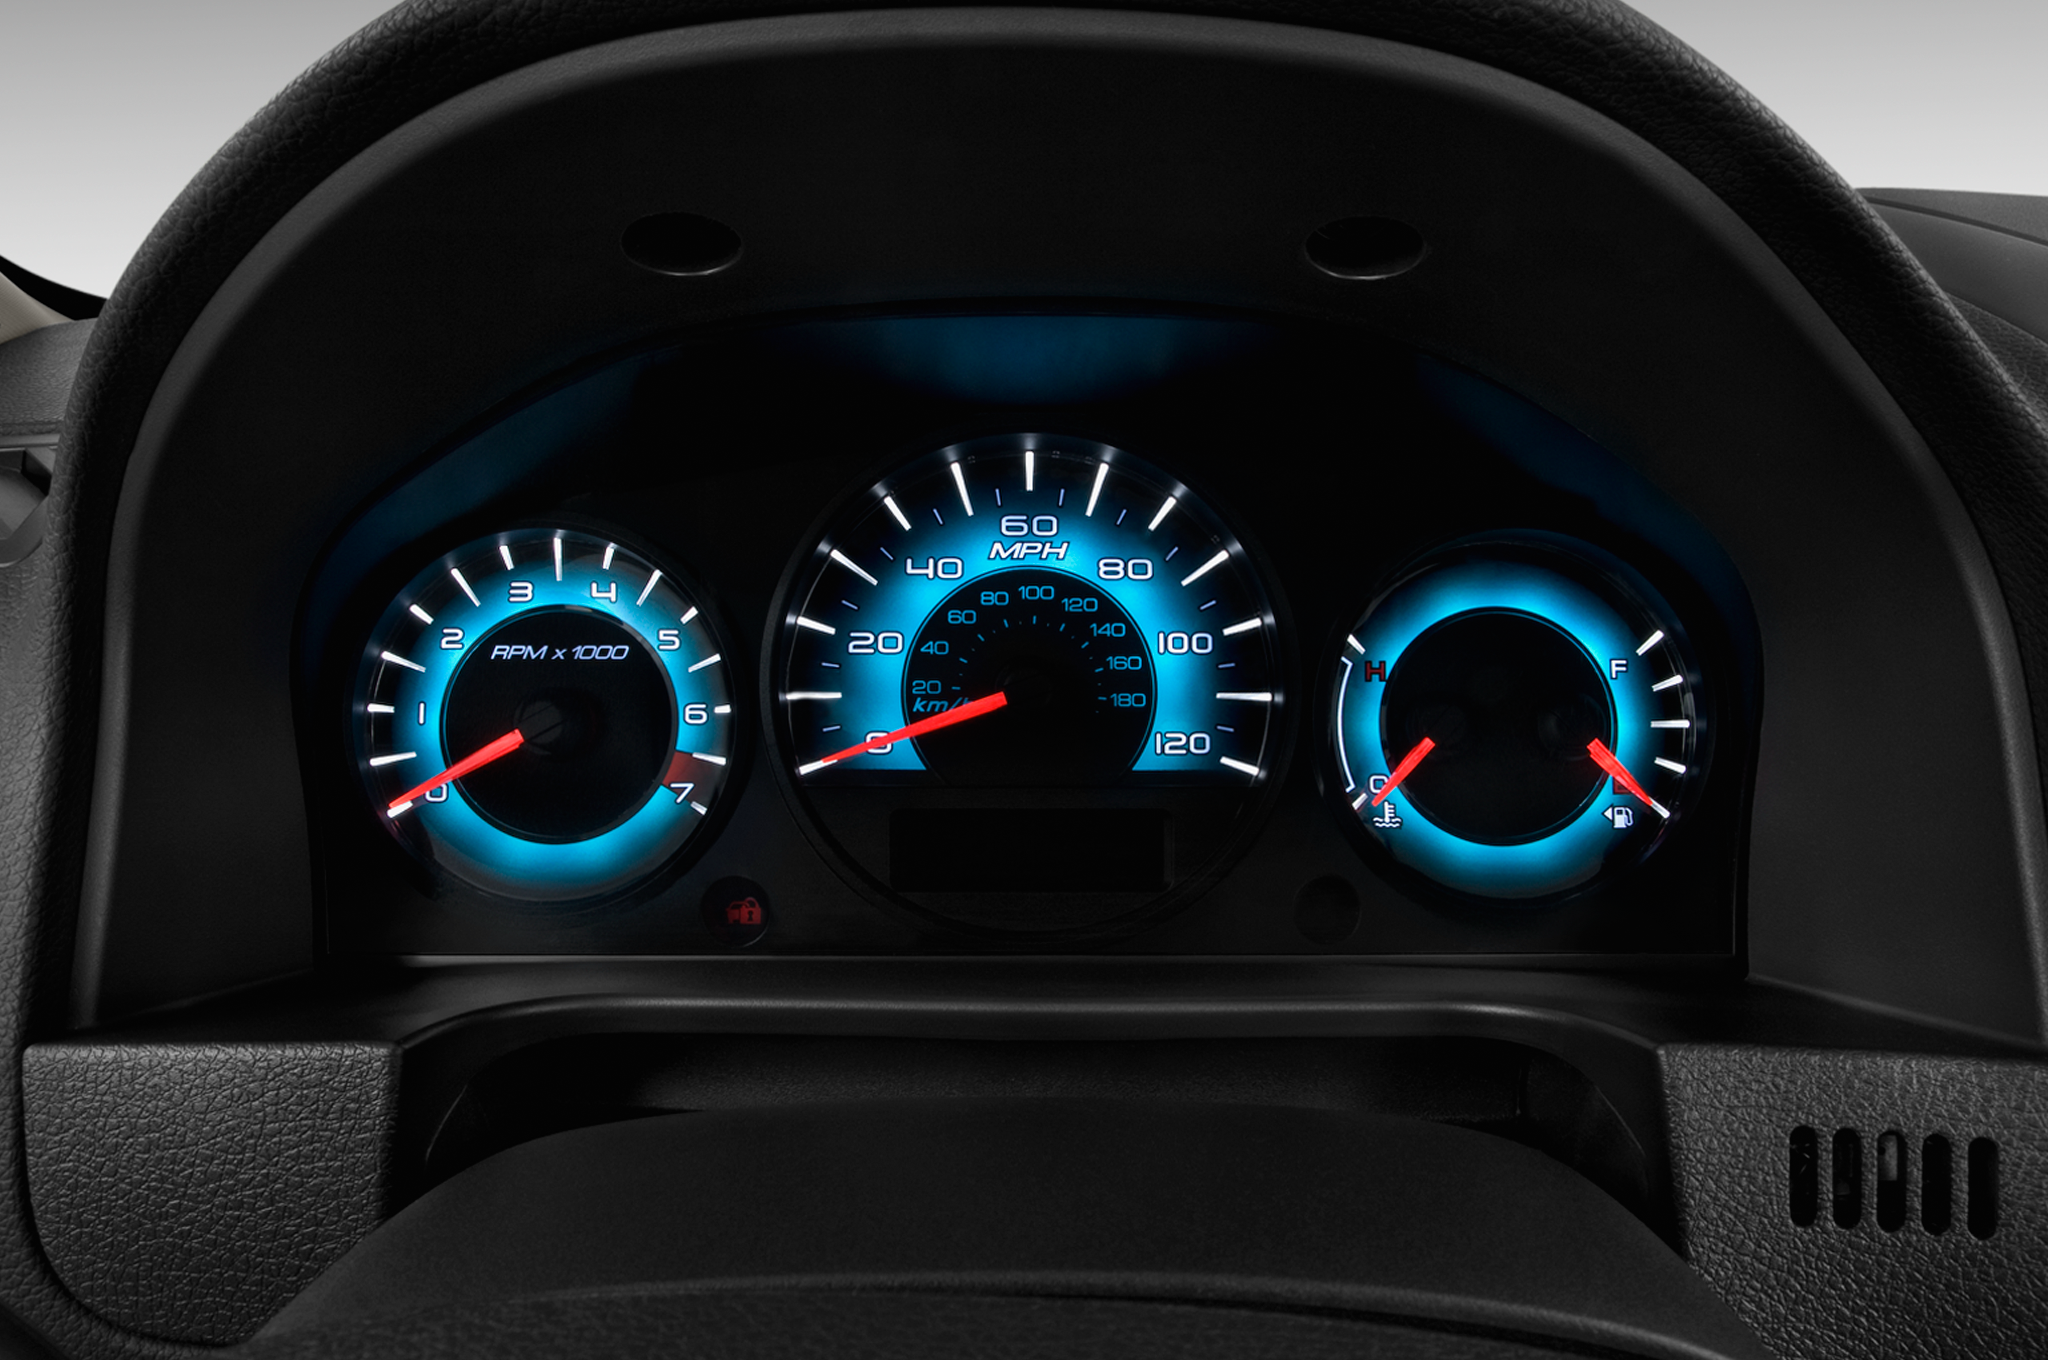 2010 Ford Fusion Hybrid - Ford Midsize Hybrid Sedan Review